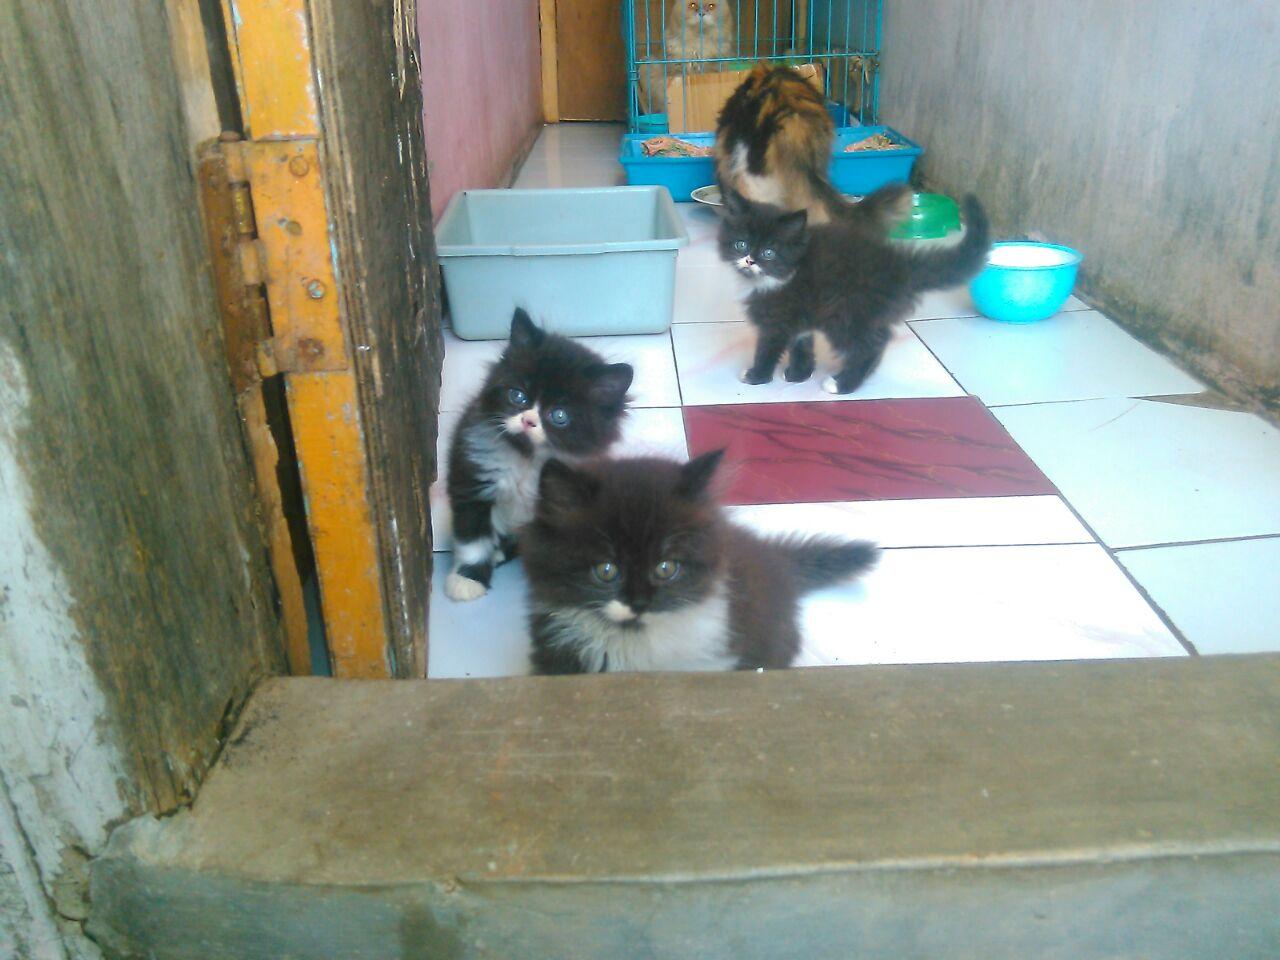 Jual Kitten Persia Medium Cirebon Pecinta Kucing Cirebon